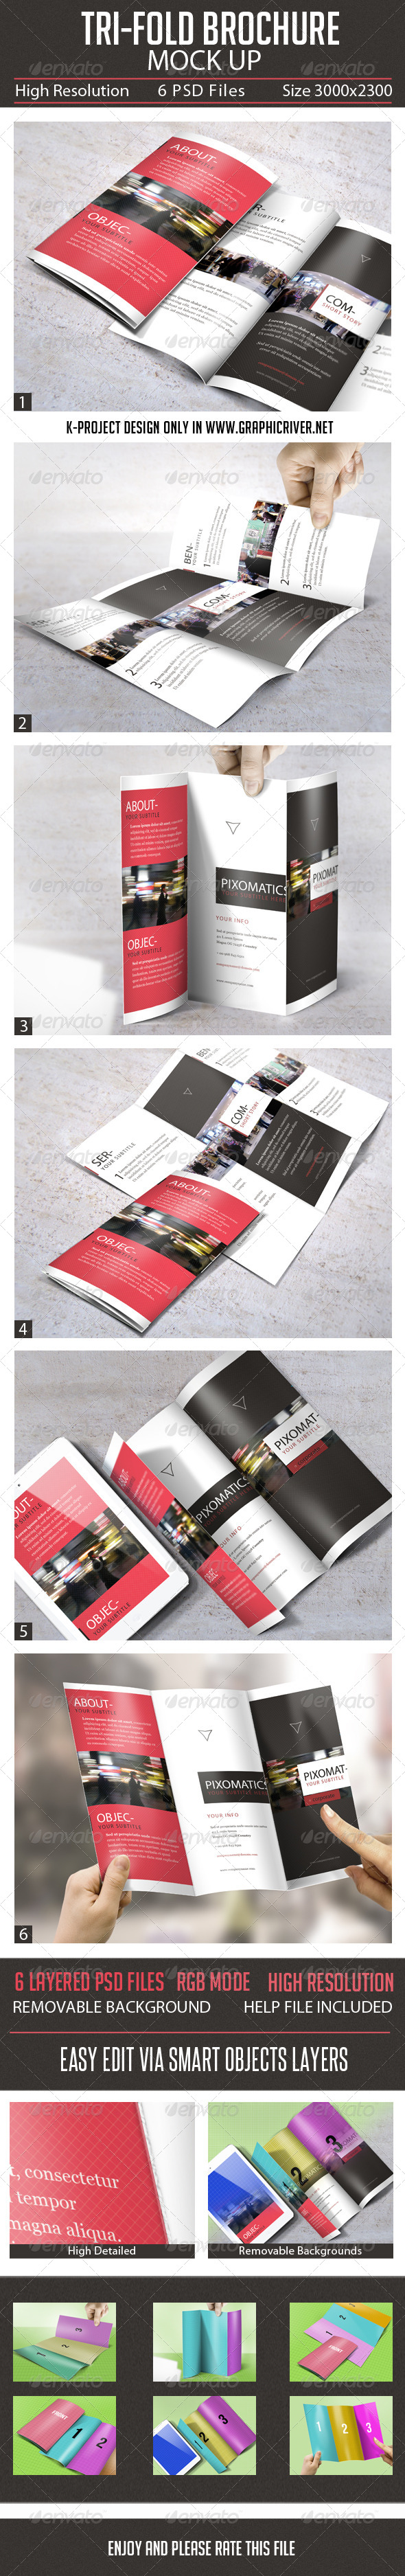 GraphicRiver Tri-Fold Brochure Mock Up 7621378